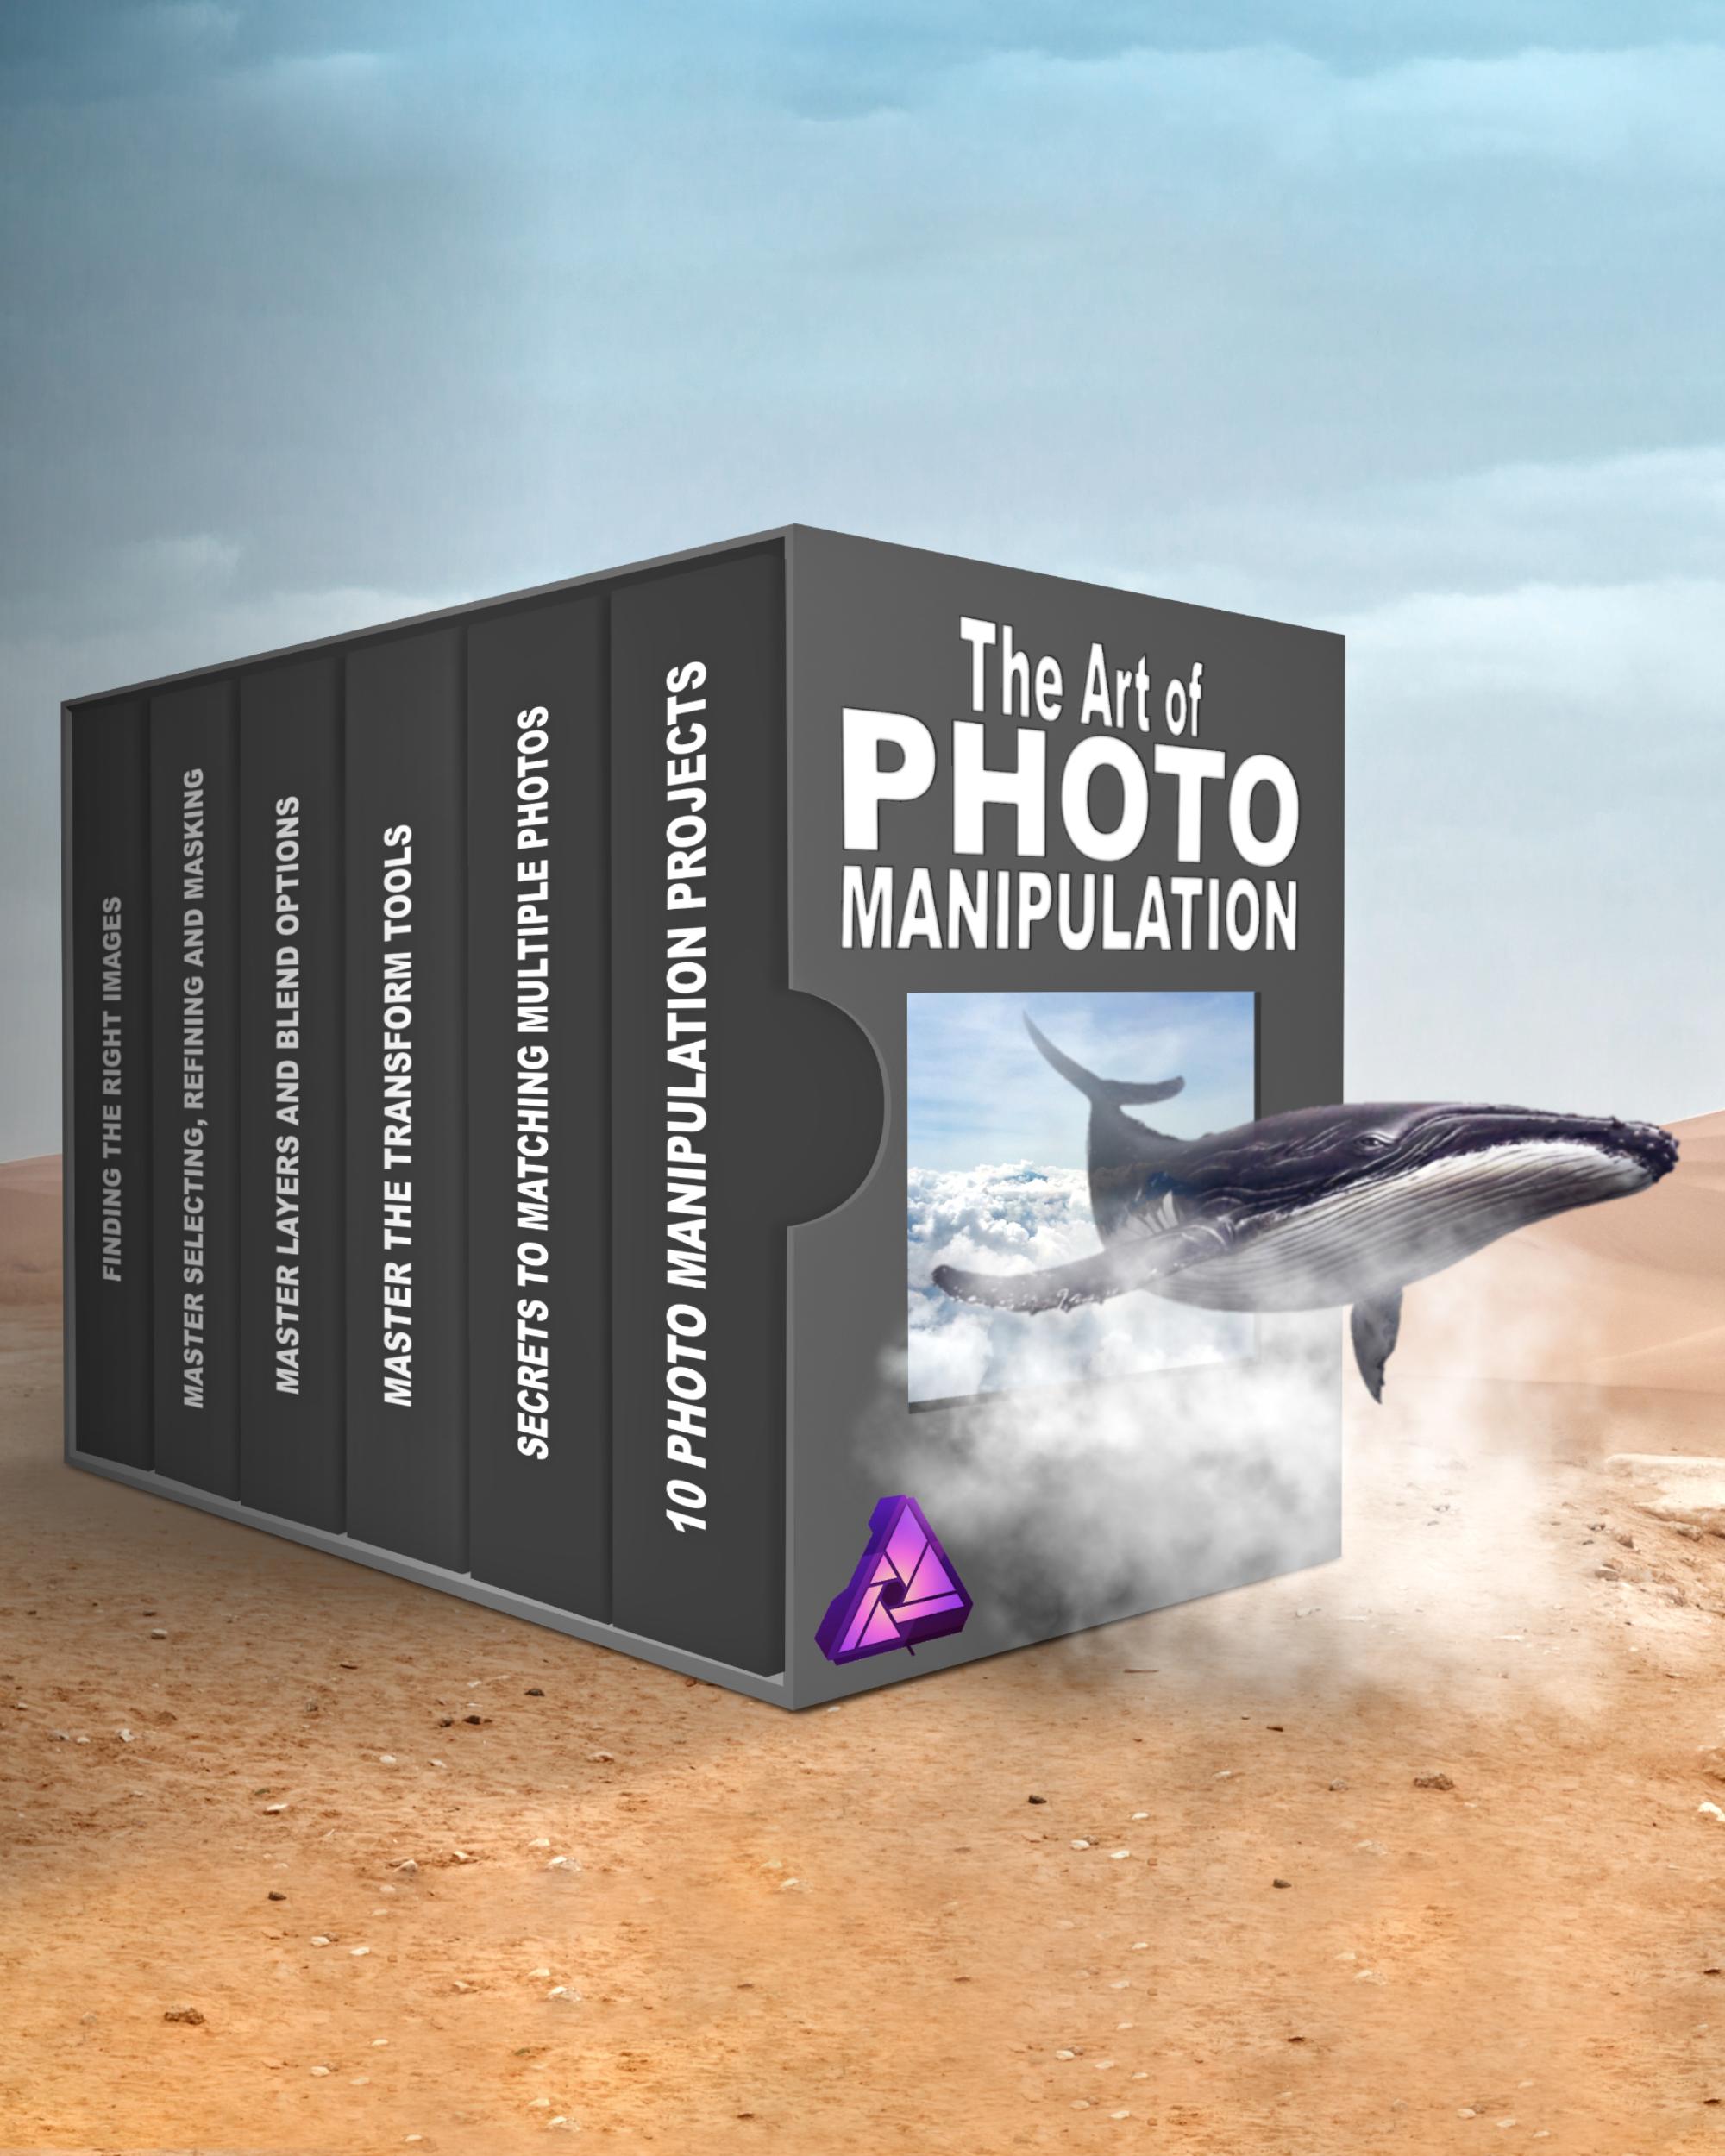 mockup_the-art-of-photo-manipulation